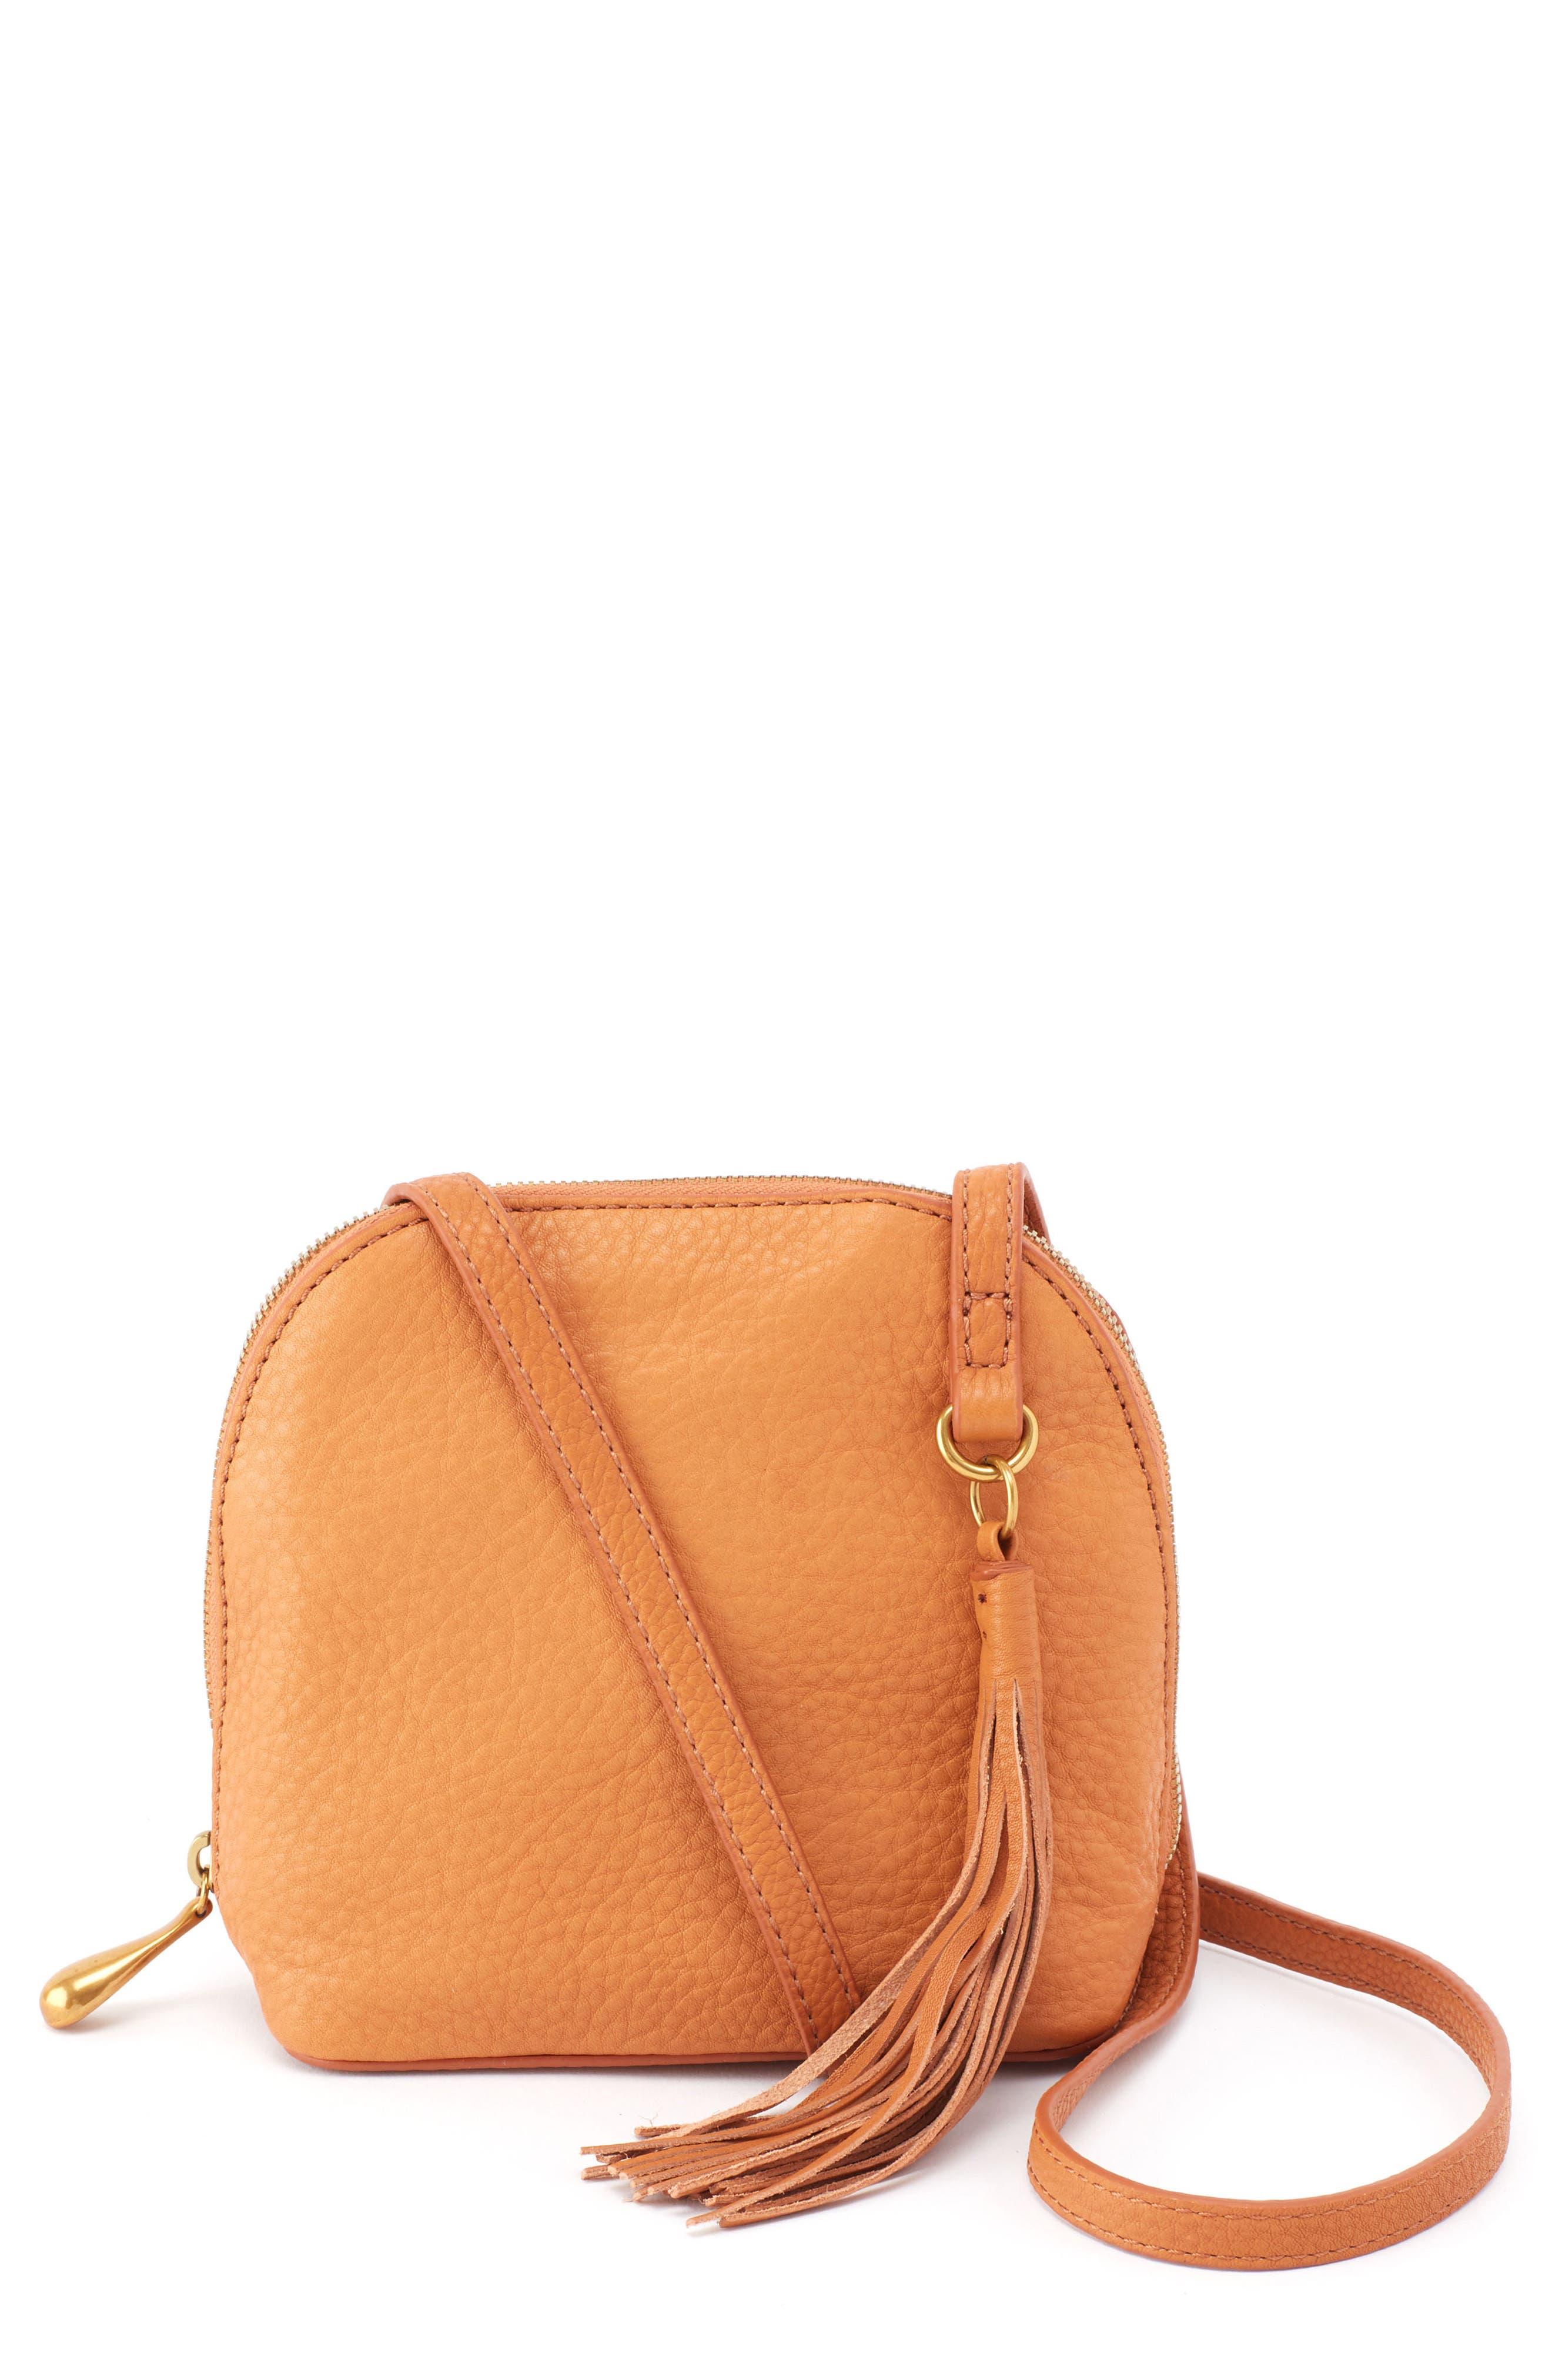 Nash Calfskin Leather Crossbody Bag,                             Main thumbnail 1, color,                             WHISKEY